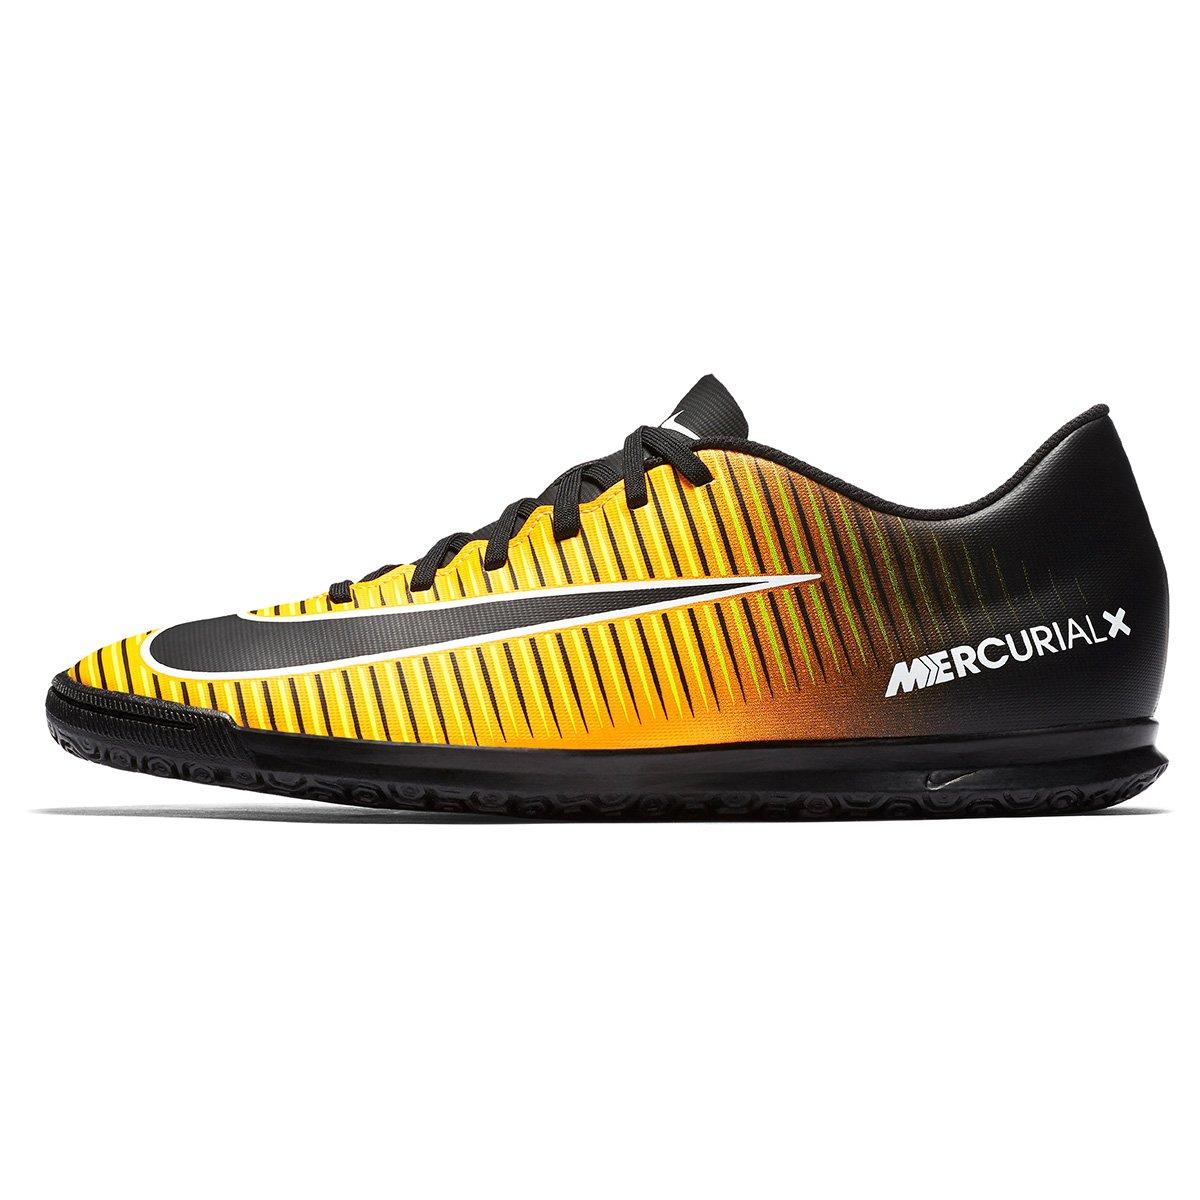 Chuteira Futsal Nike Mercurial Vortex 3 IC - Compre Agora  c1b9840ebf43f